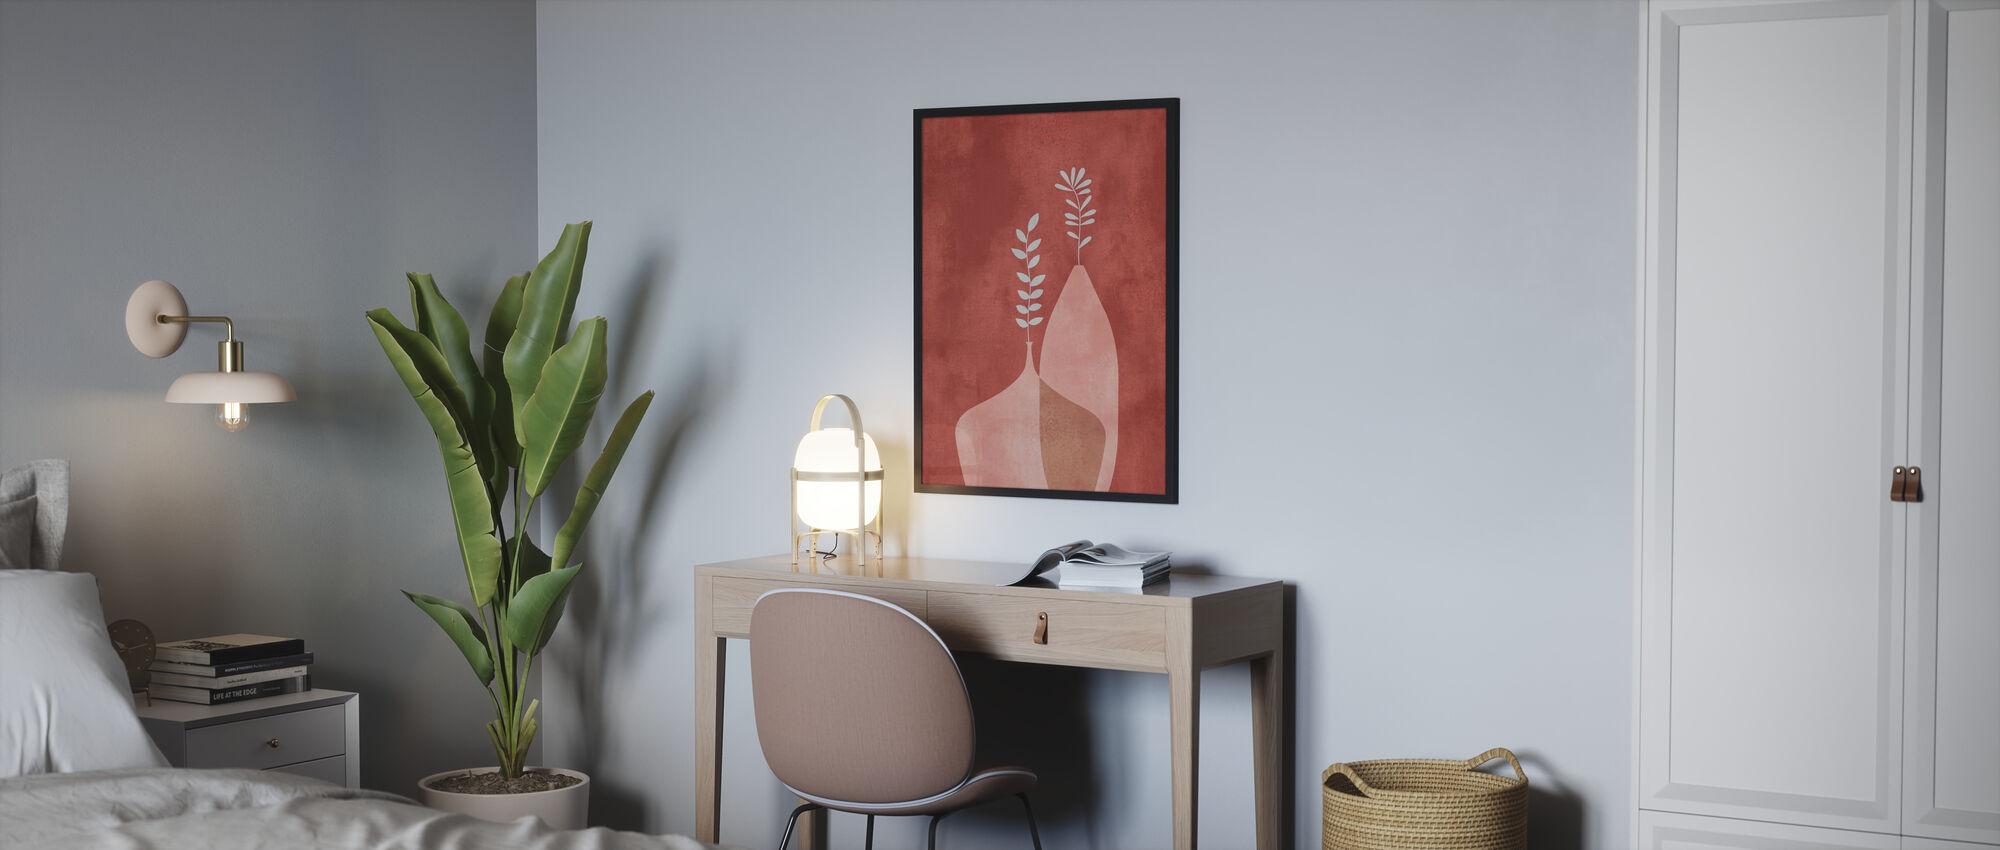 Melancholy - Poster - Bedroom